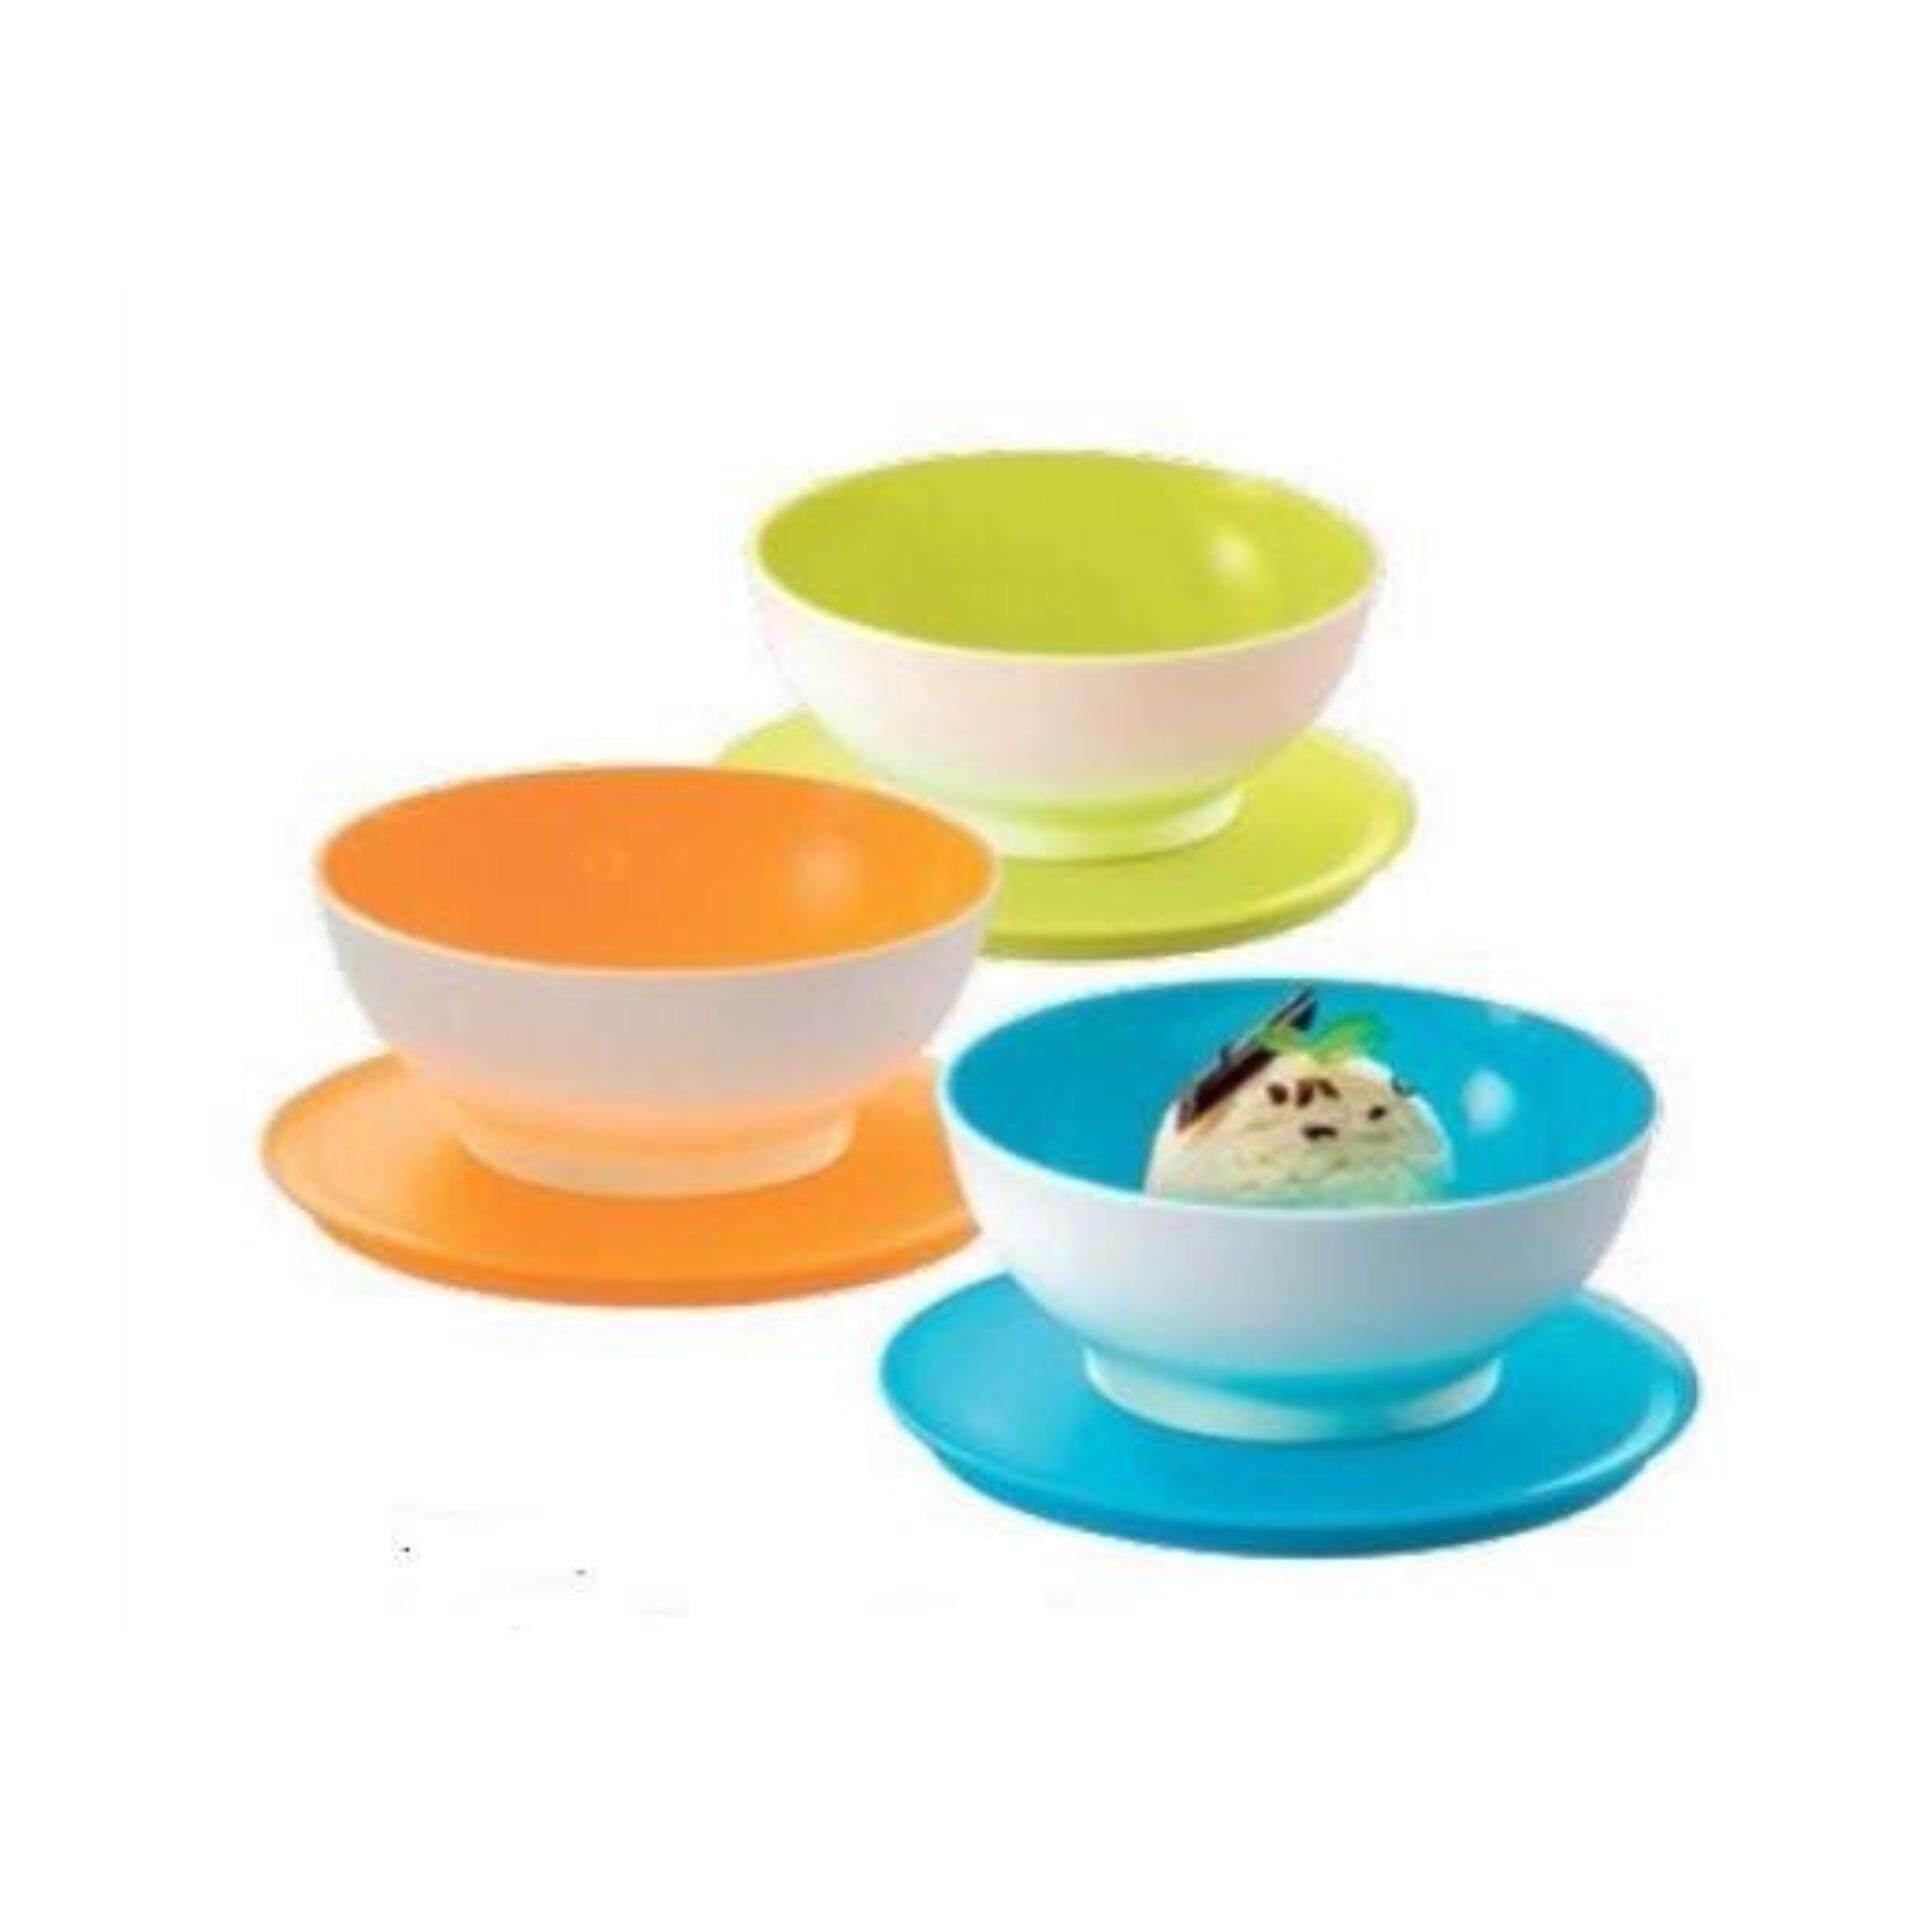 Lynn2u All Products Tupperware Eleganzia Bowl 600ml 4 Set Allegra Dessert Bowls 3 275ml